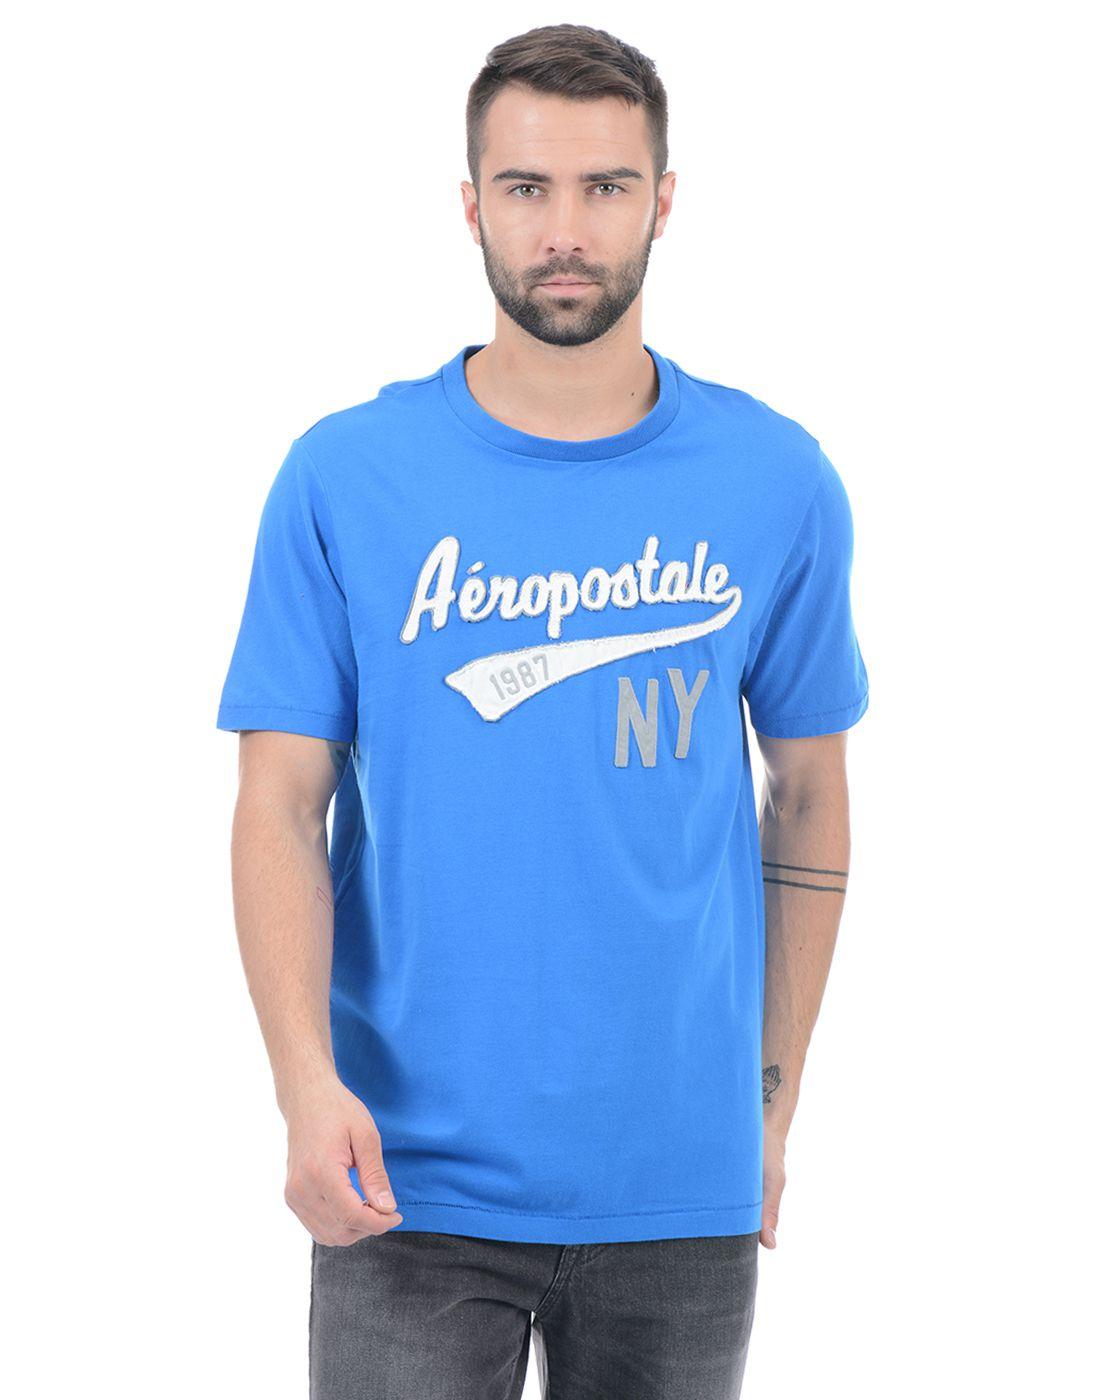 Aeropostale Blue Round T-Shirt